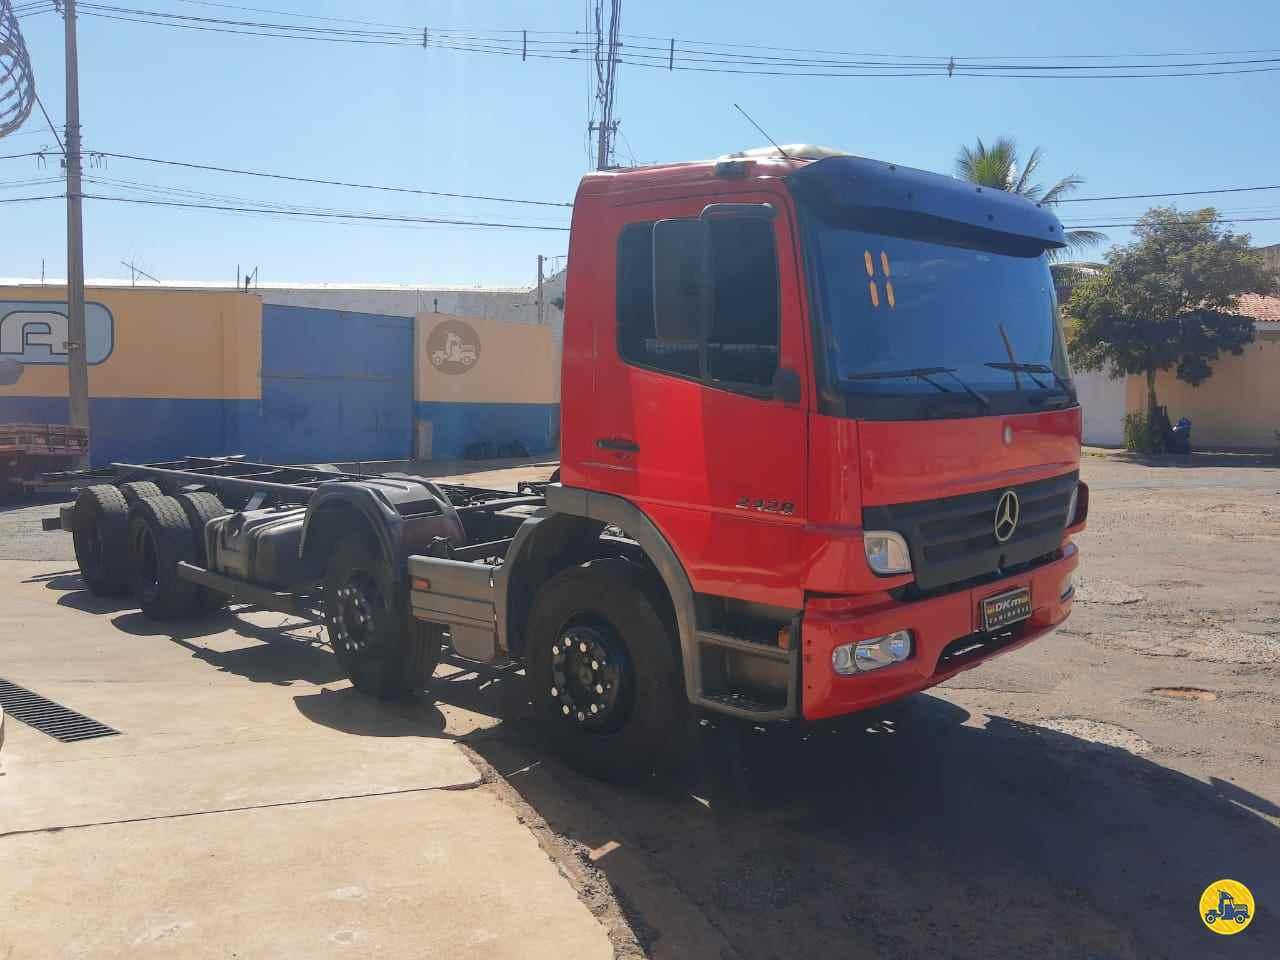 MERCEDES-BENZ MB 2428 939000km 2011/2011 DKM Caminhões